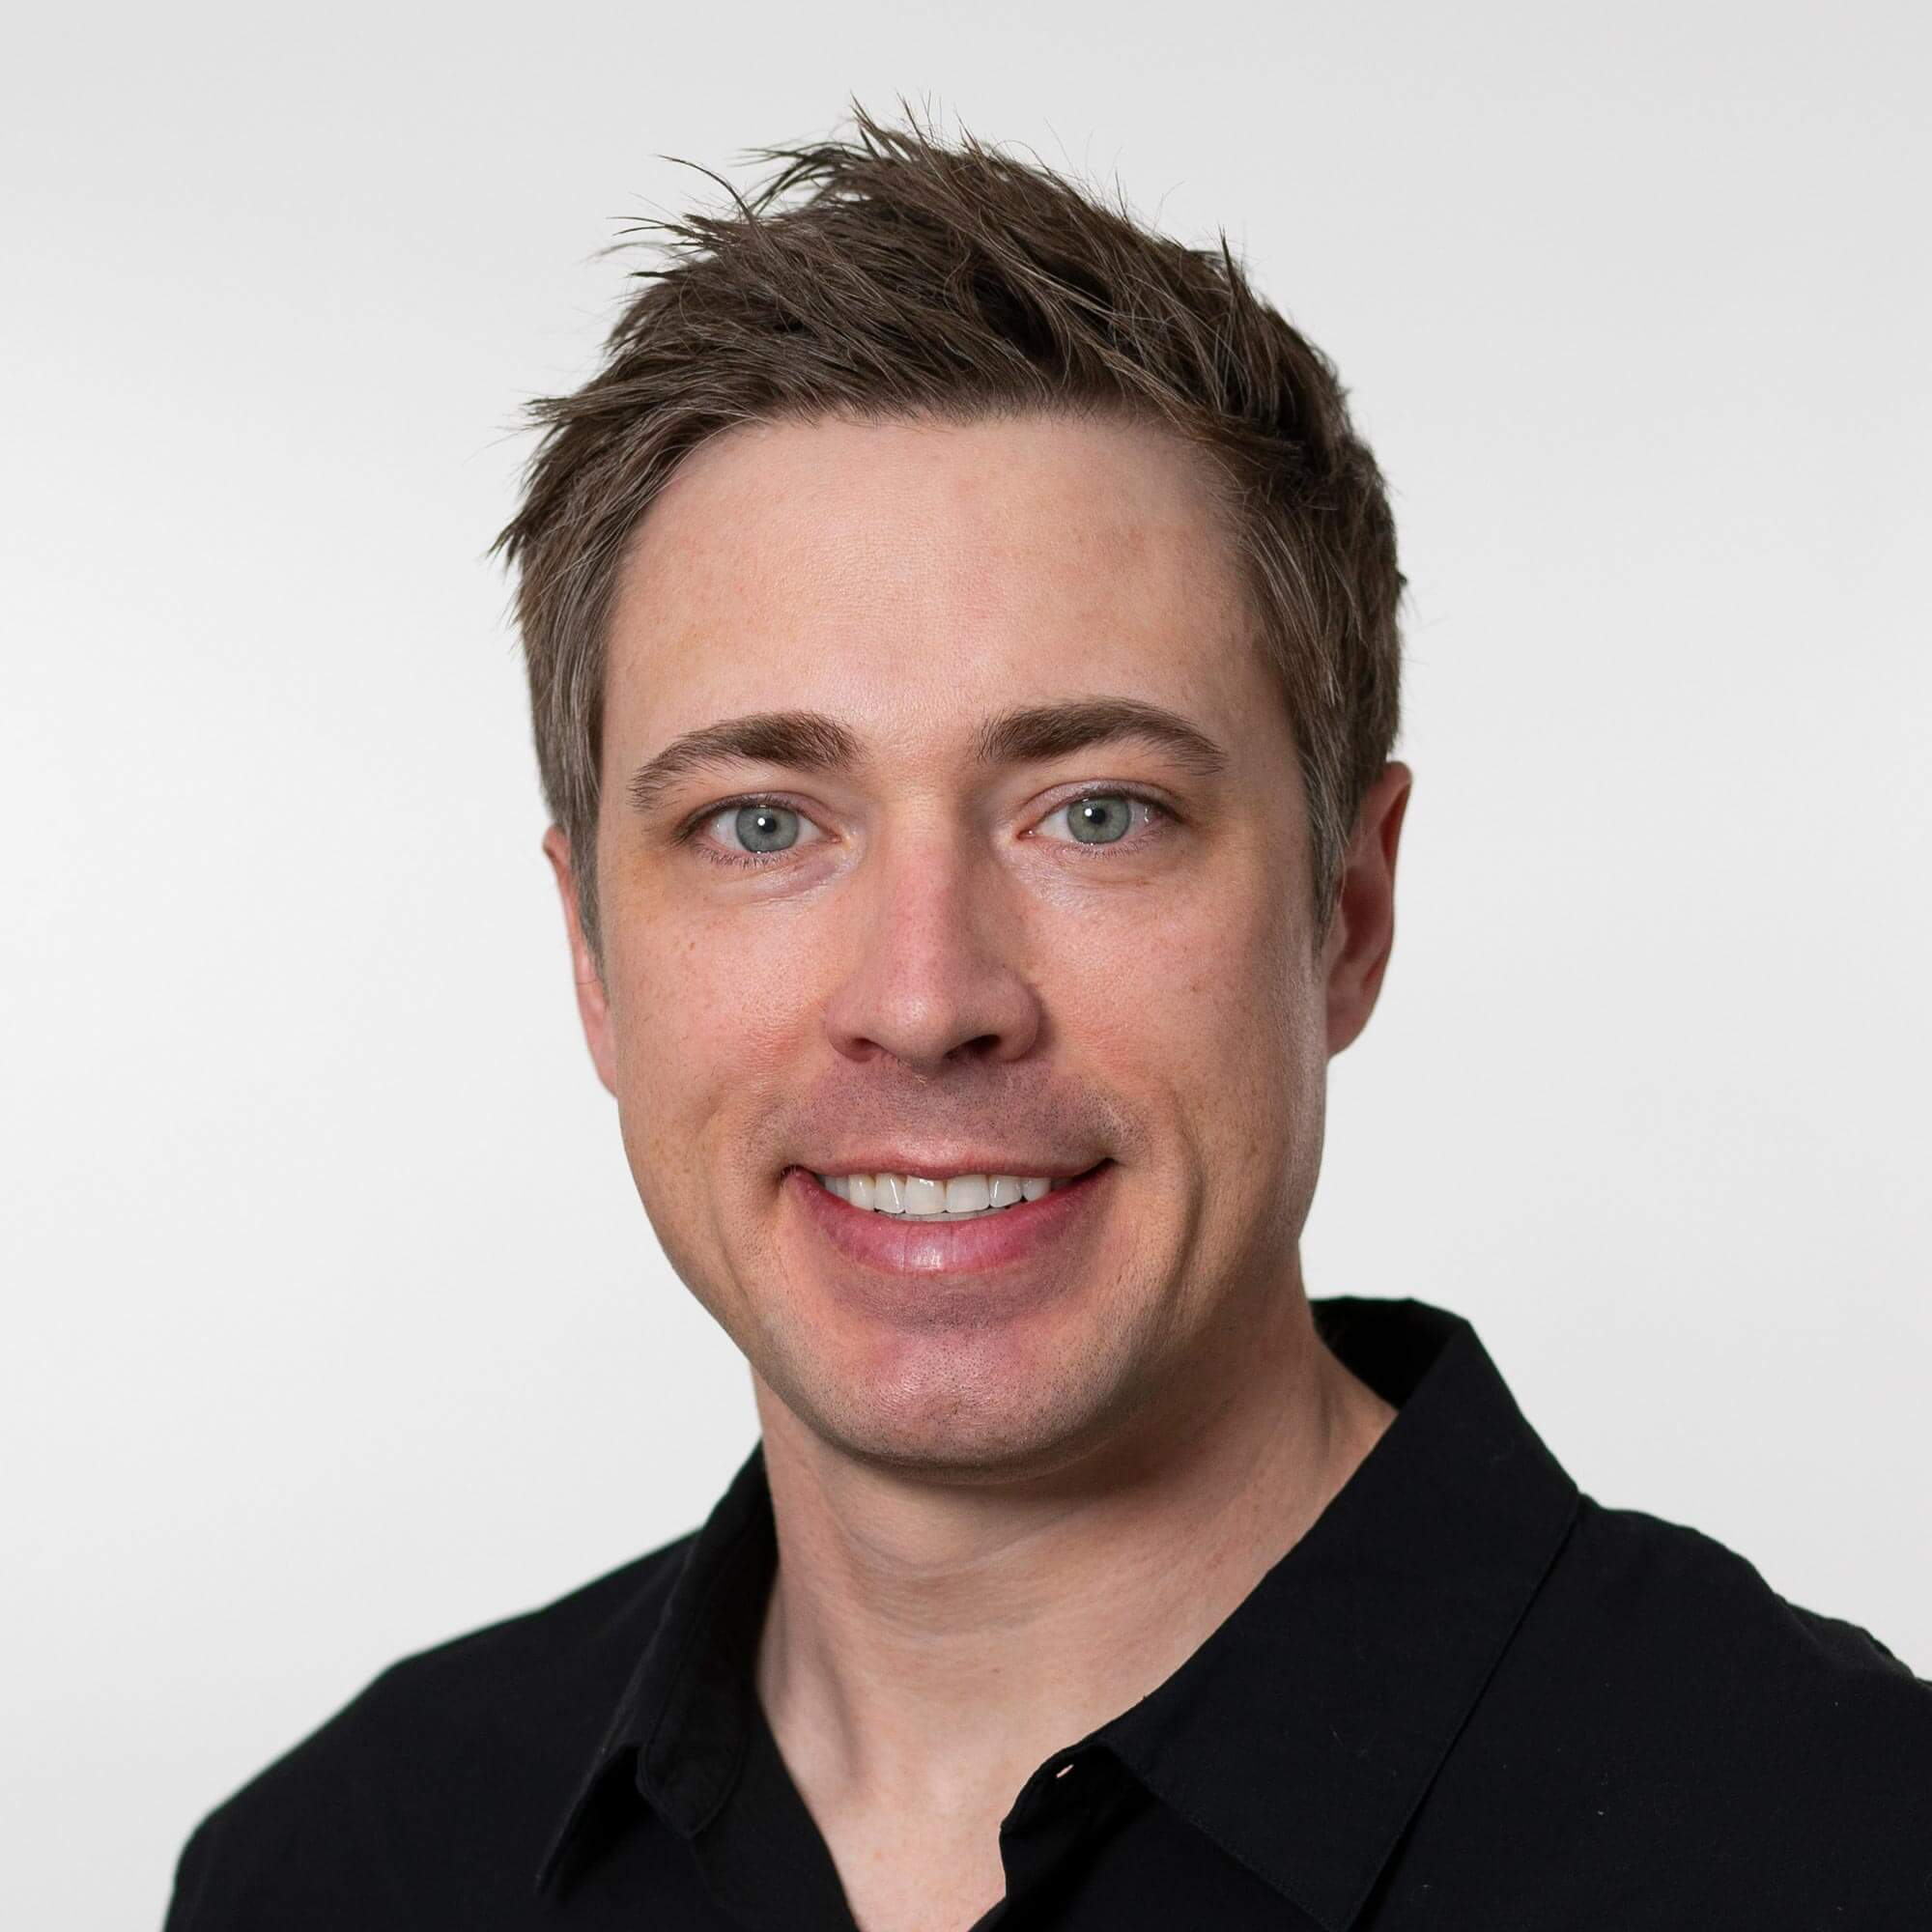 Doctor Kyle Skjei